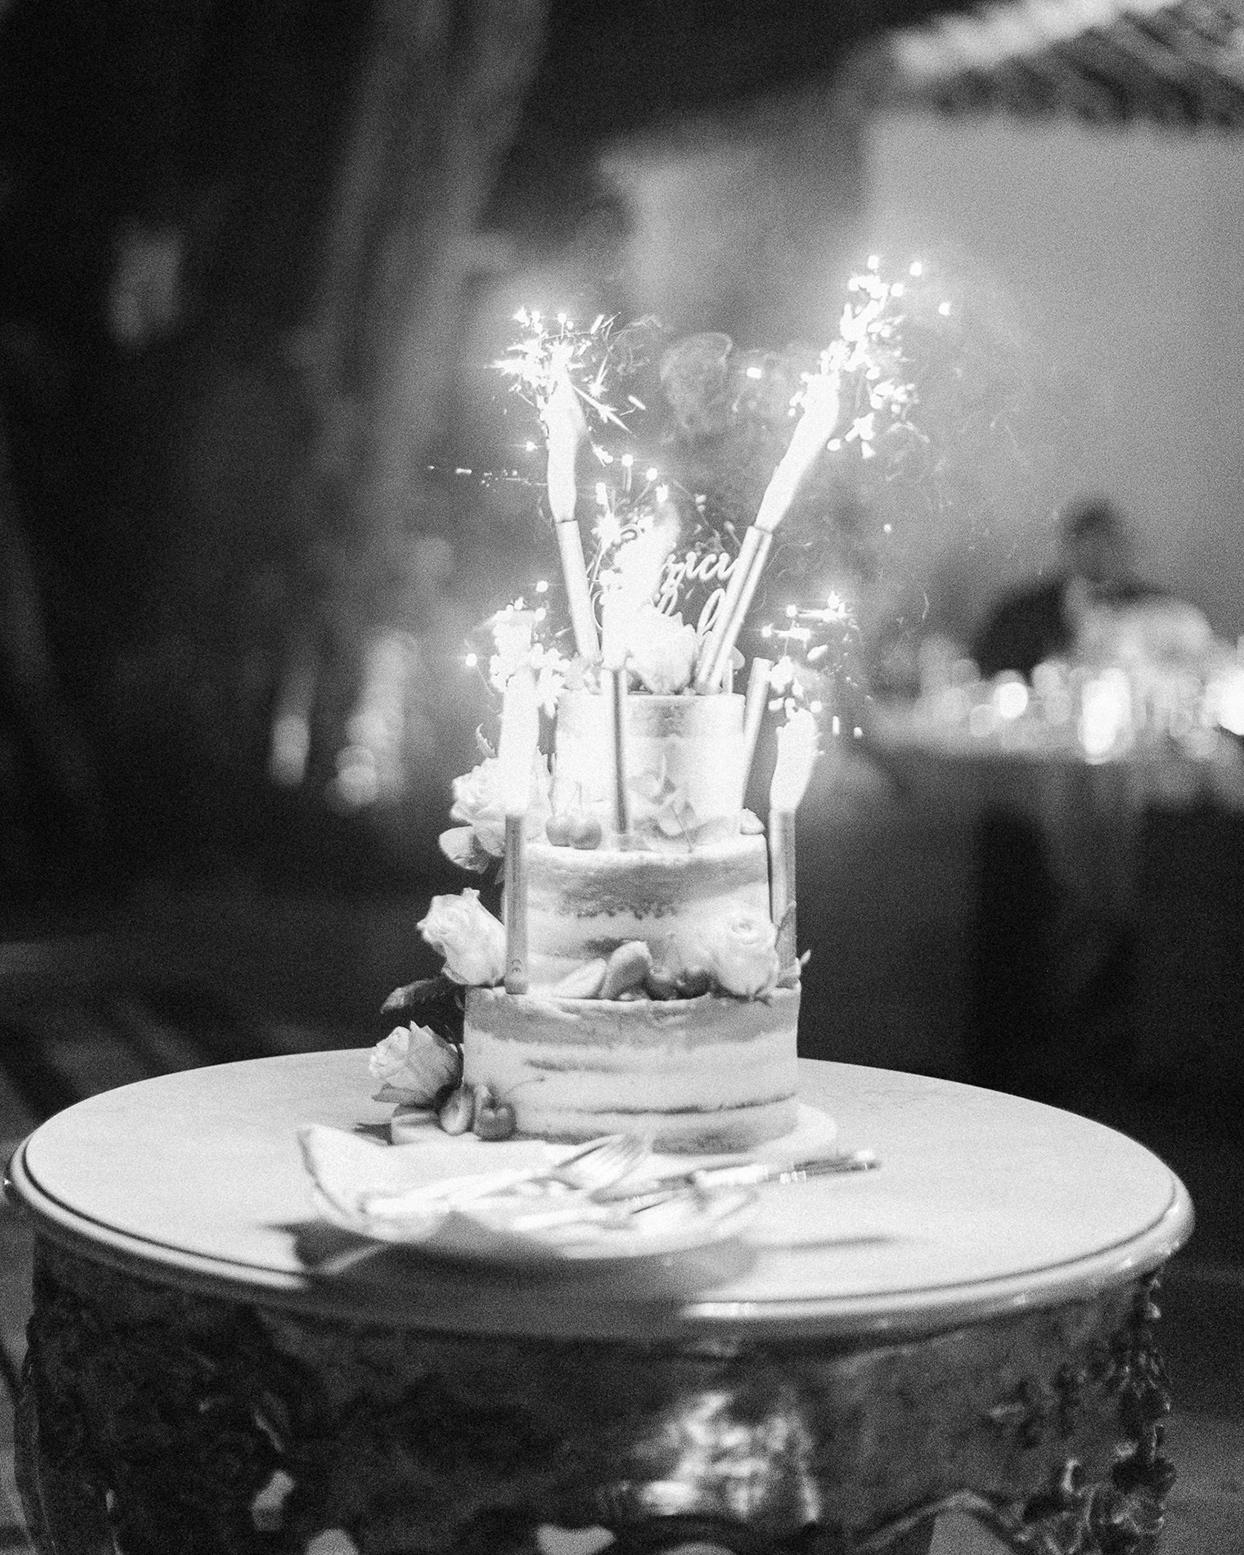 patricia ralph wedding cake with fireworks